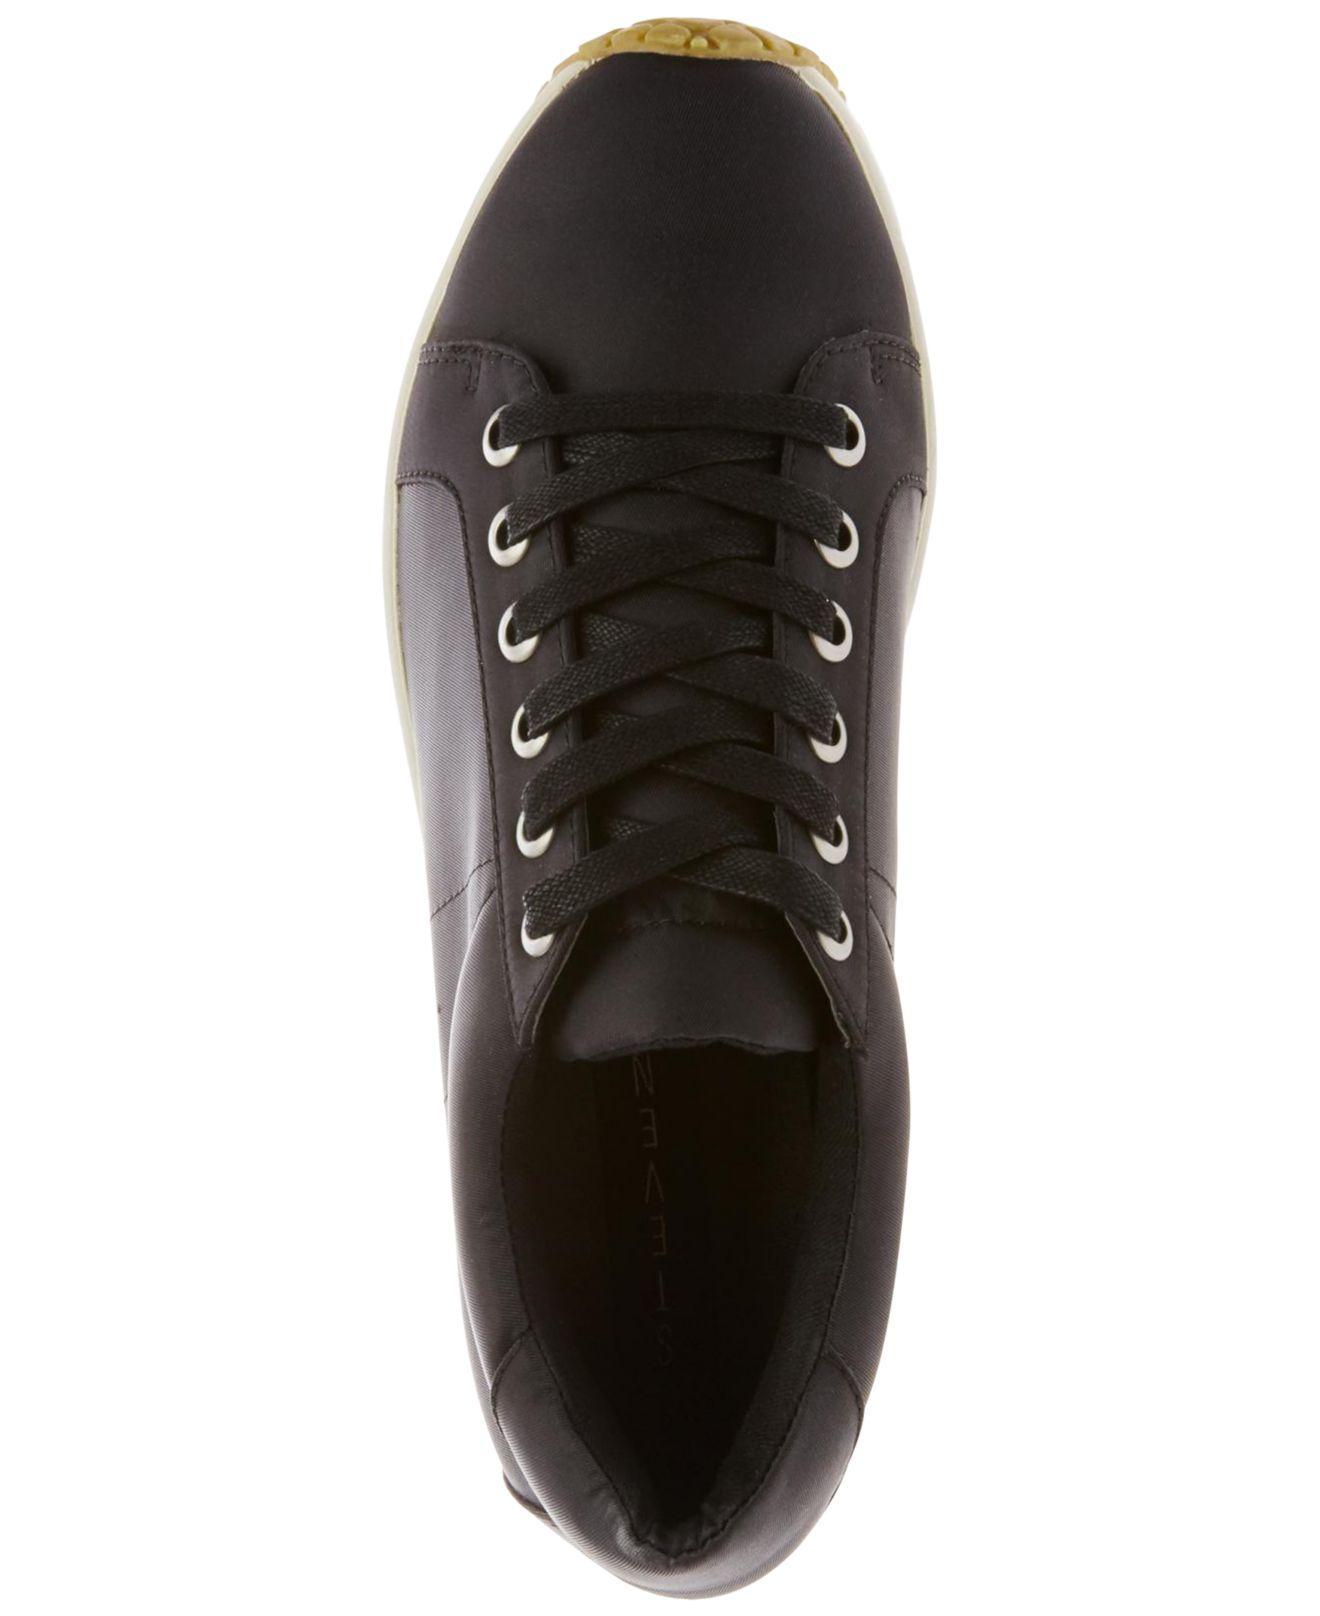 c3088c1befa Lyst - Steven by Steve Madden Women s Barb Platform Sneakers in Black